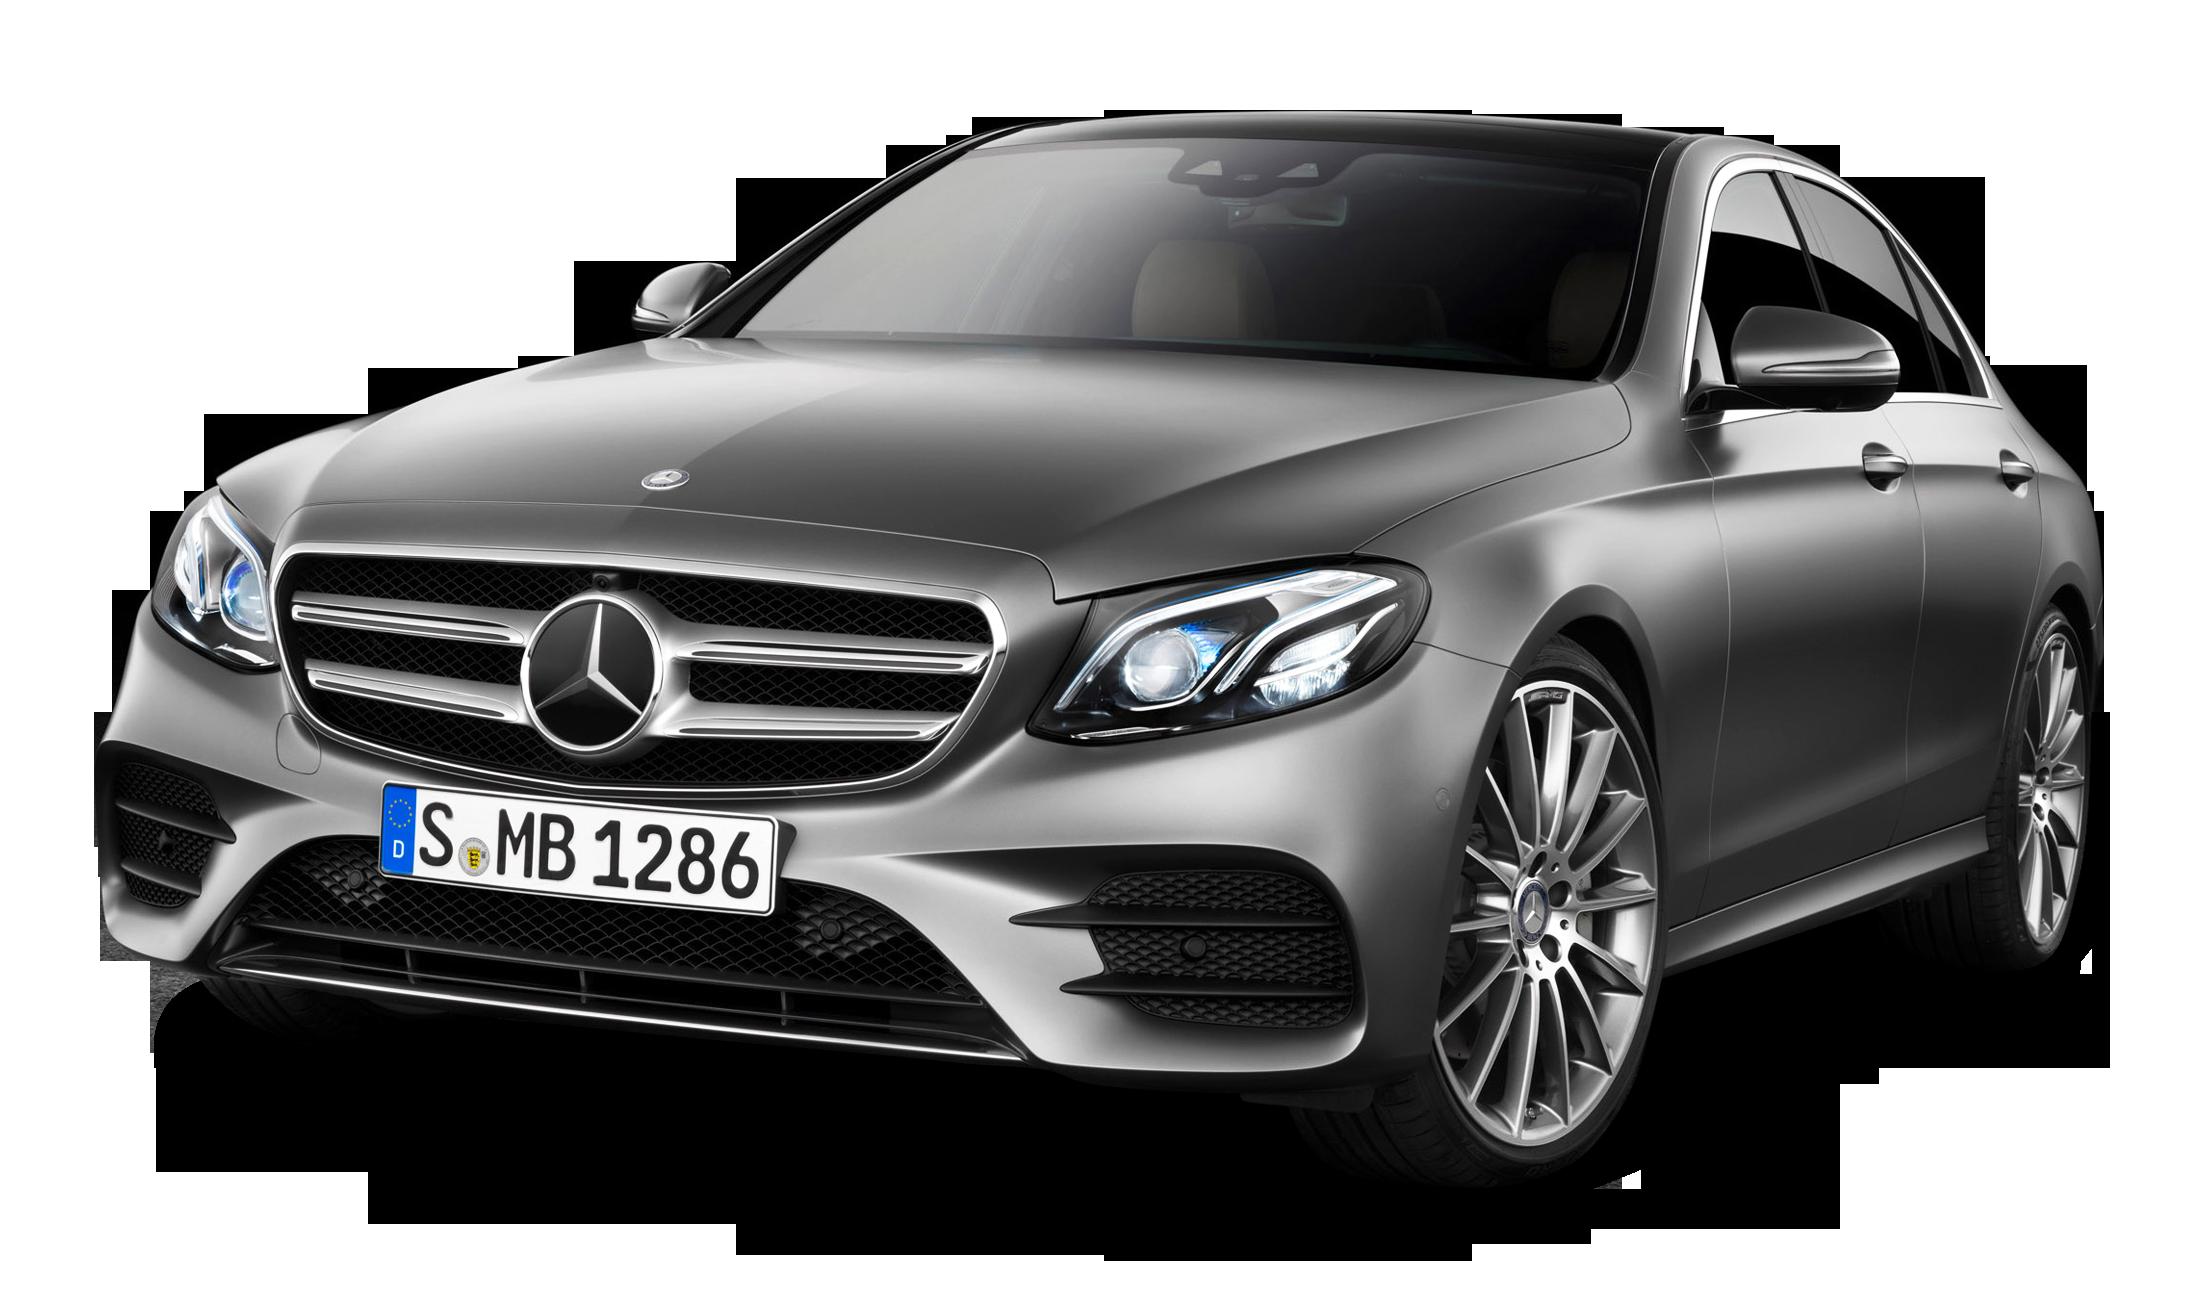 Grey Mercedes Benz E Class Car Png Image Benz E Class Benz E Mercedes Benz